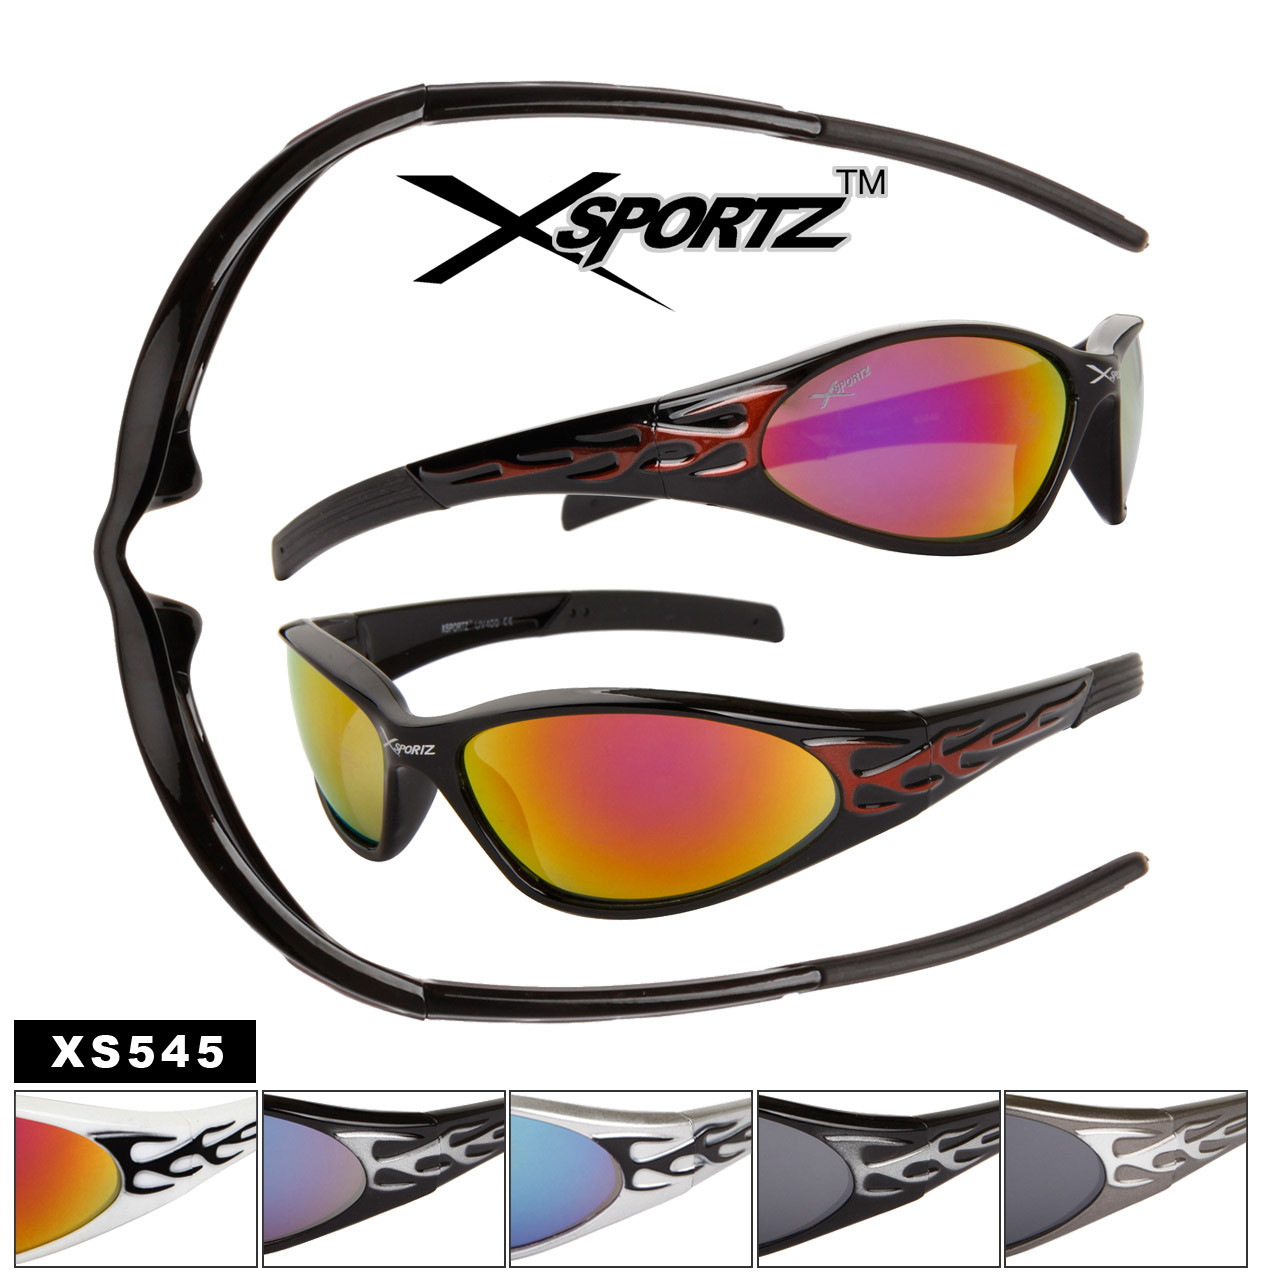 Xsportz™ Men's Sports Sunglasses - Style # XS545